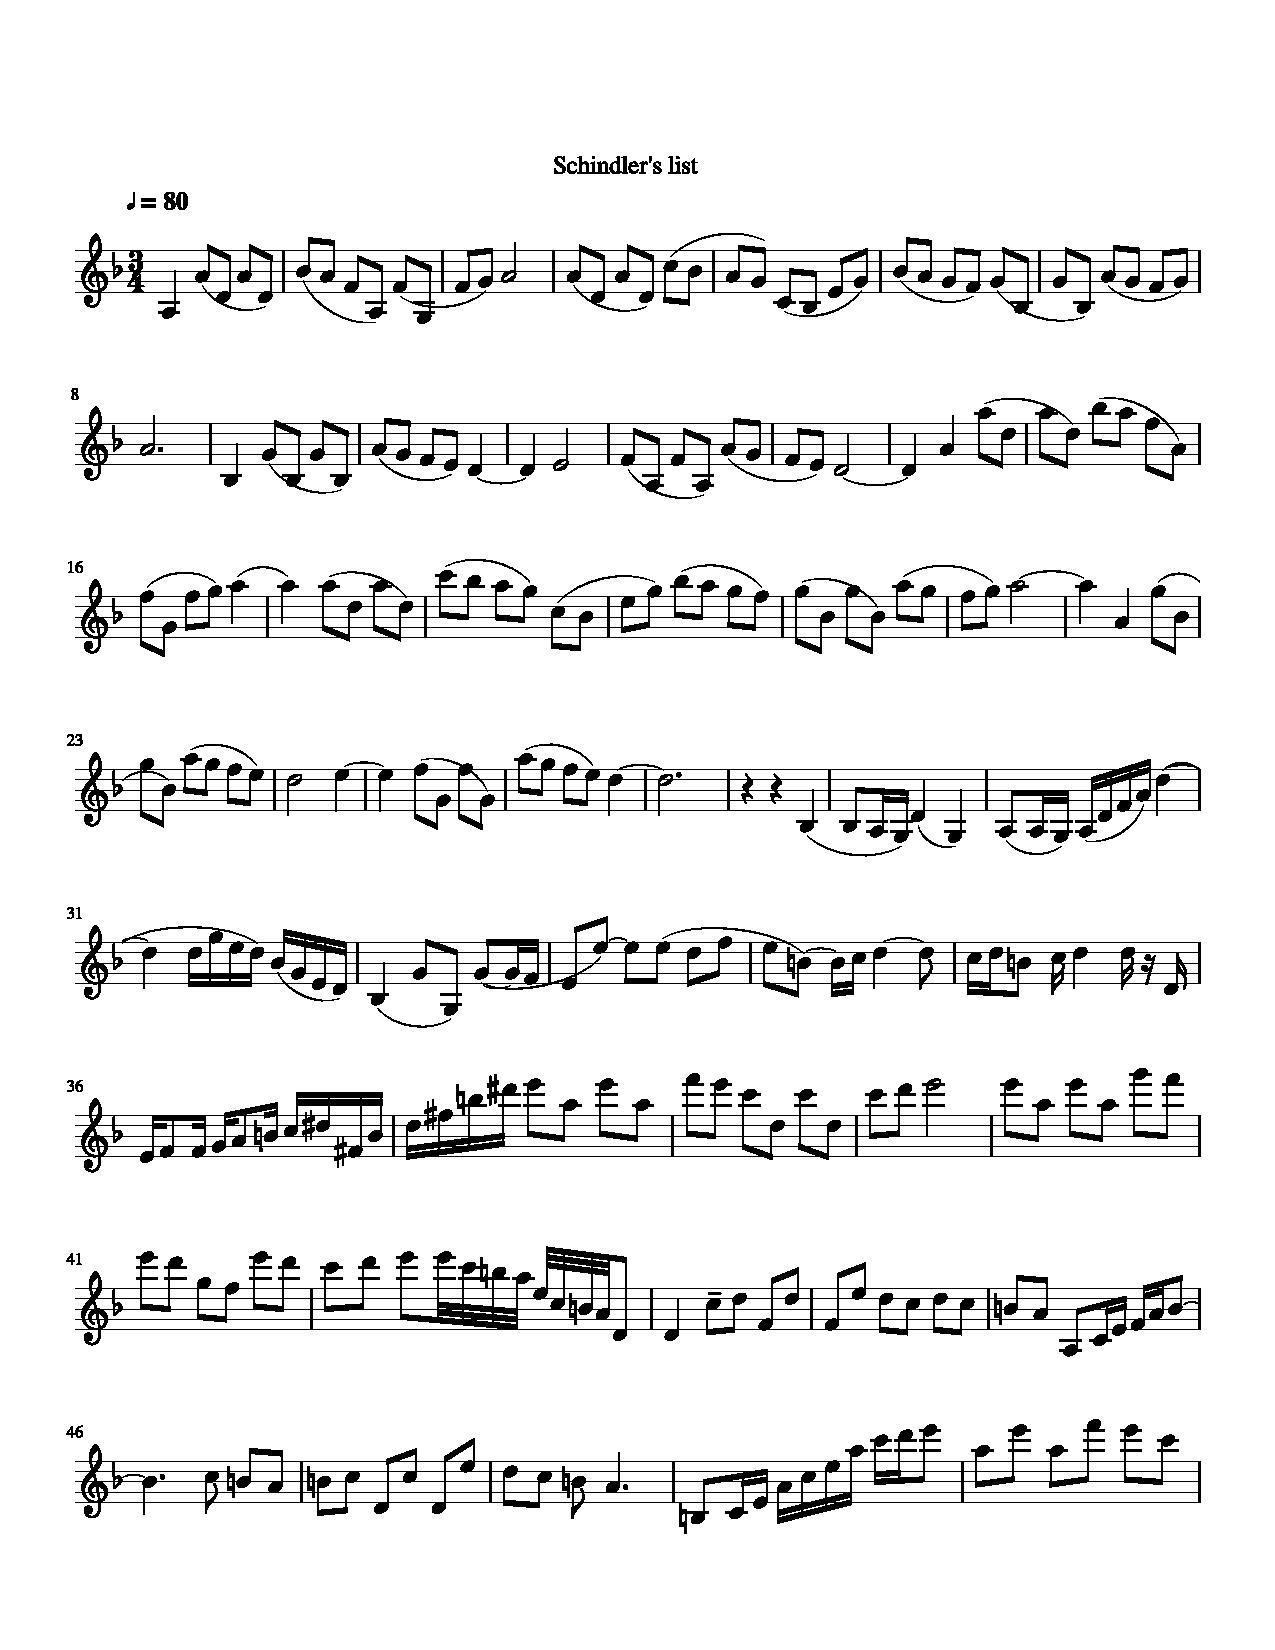 schindlers list violin sheet music